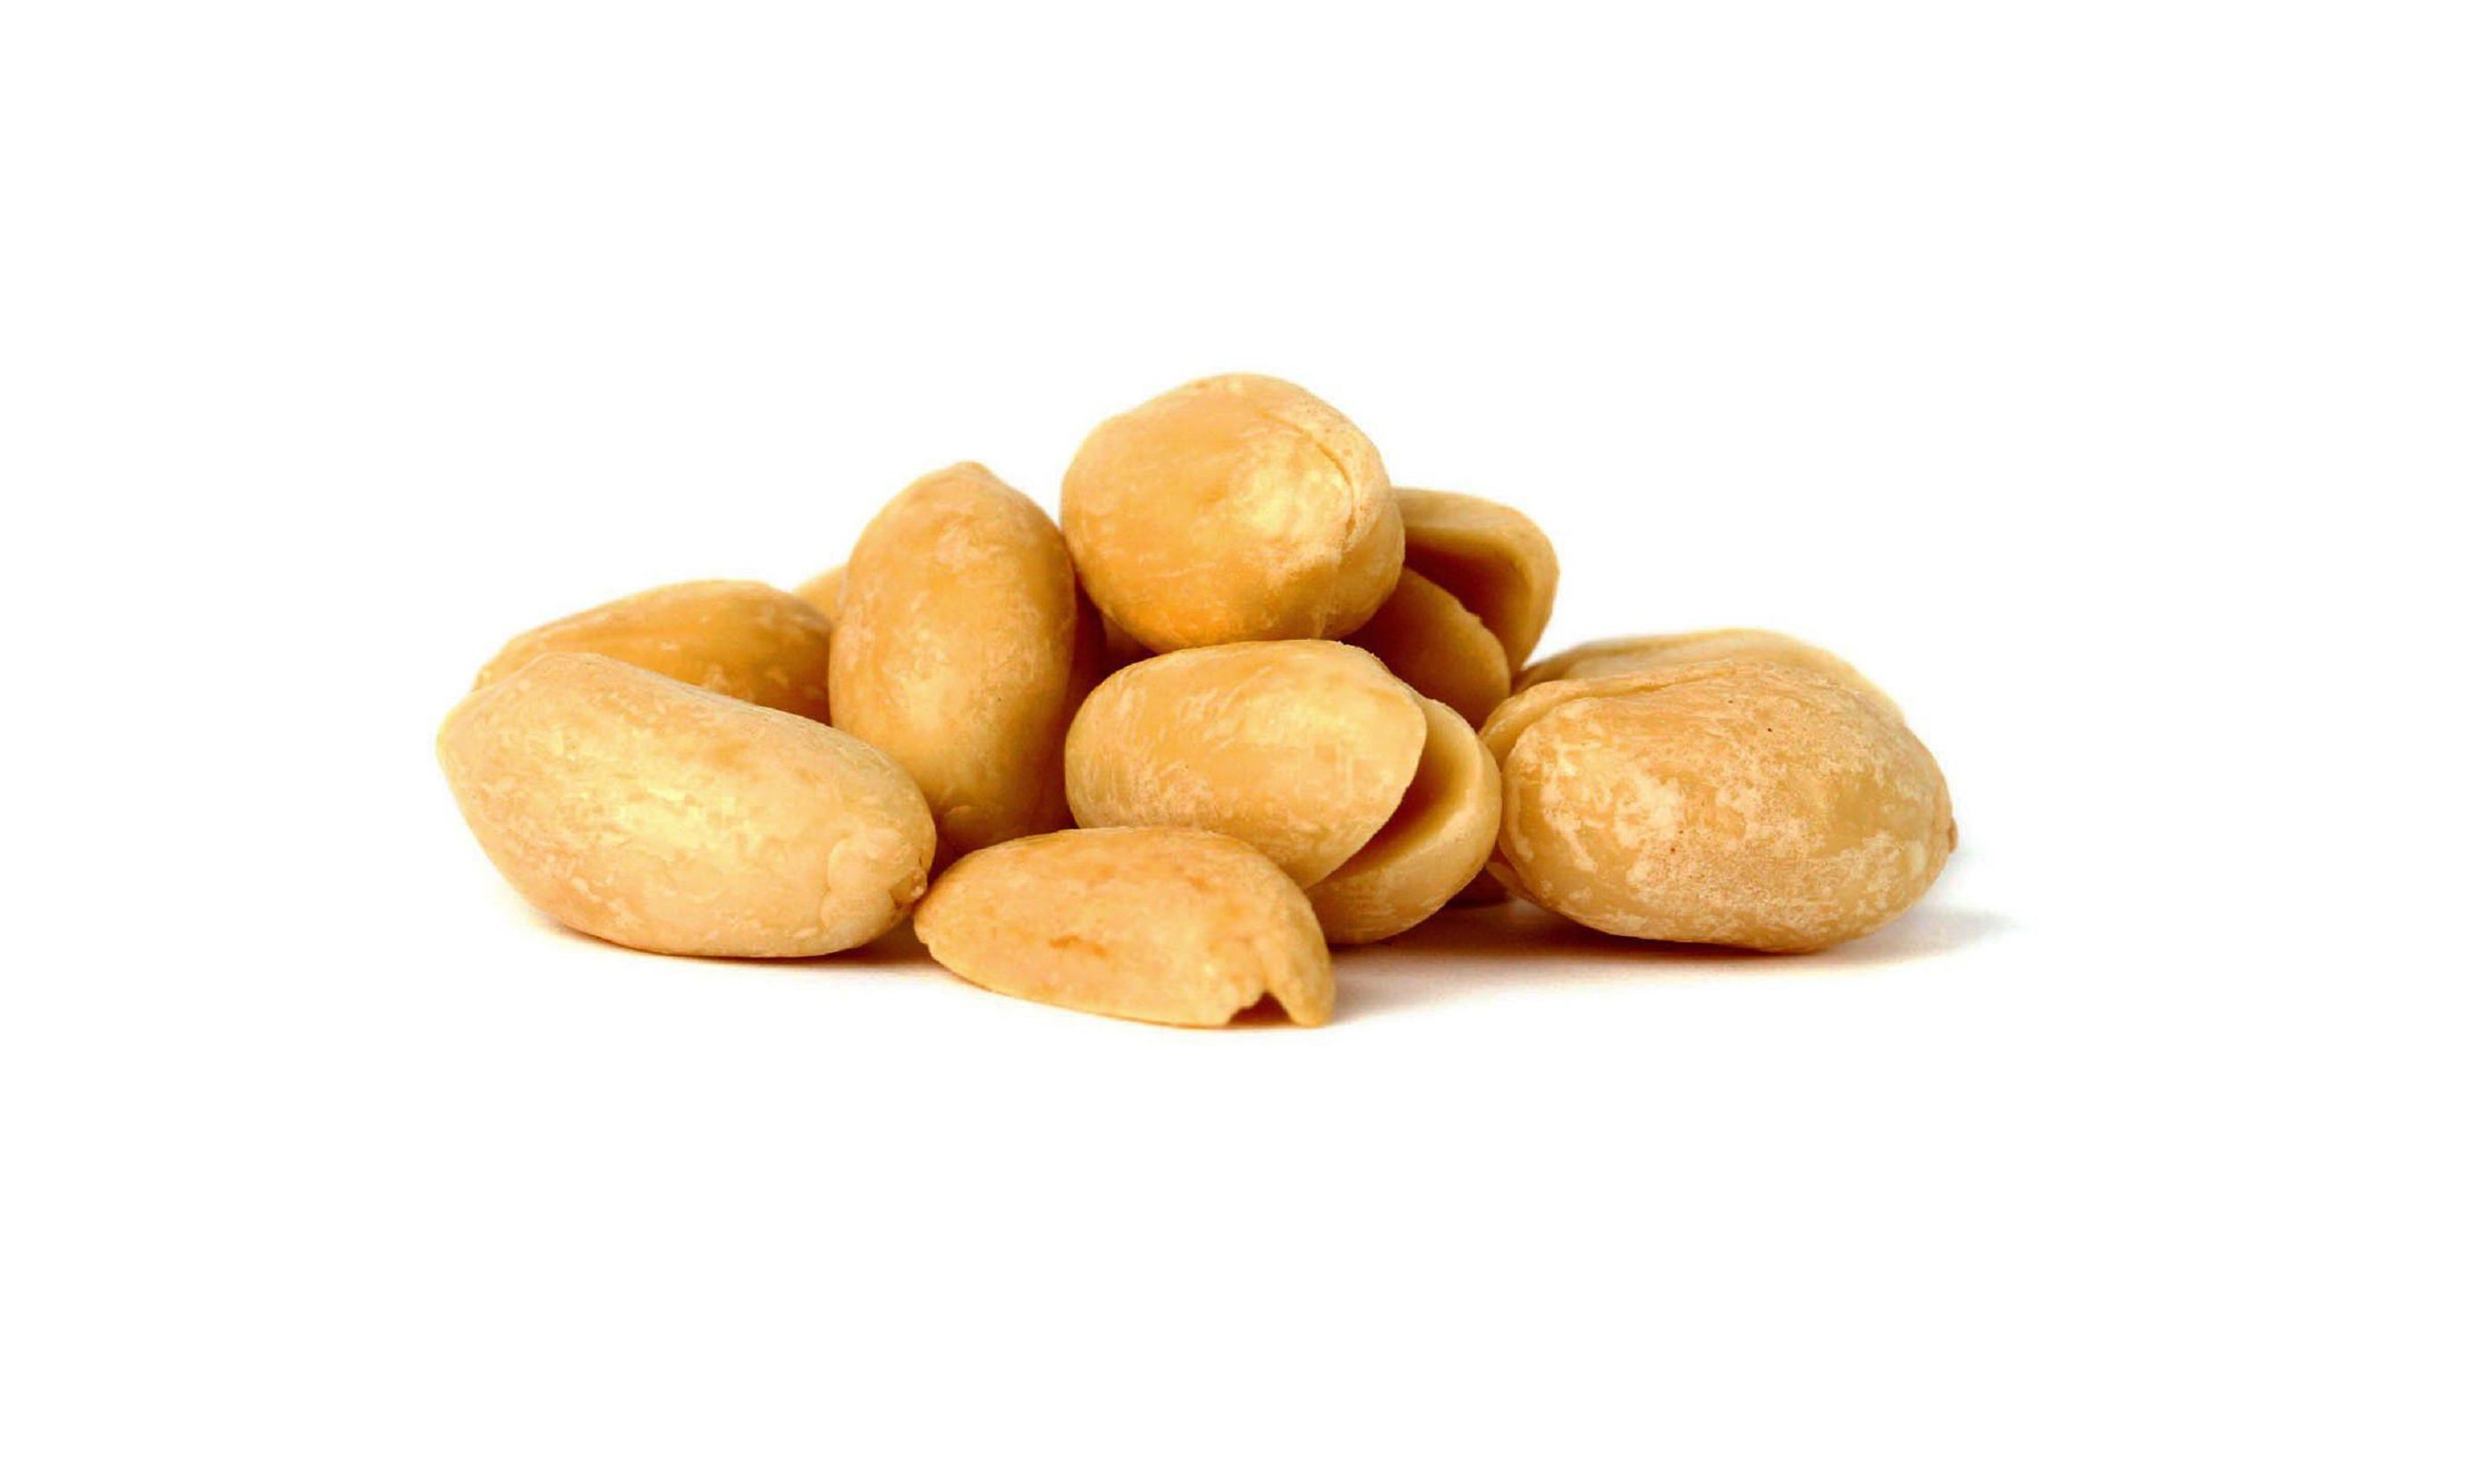 Peanuts Hd Background